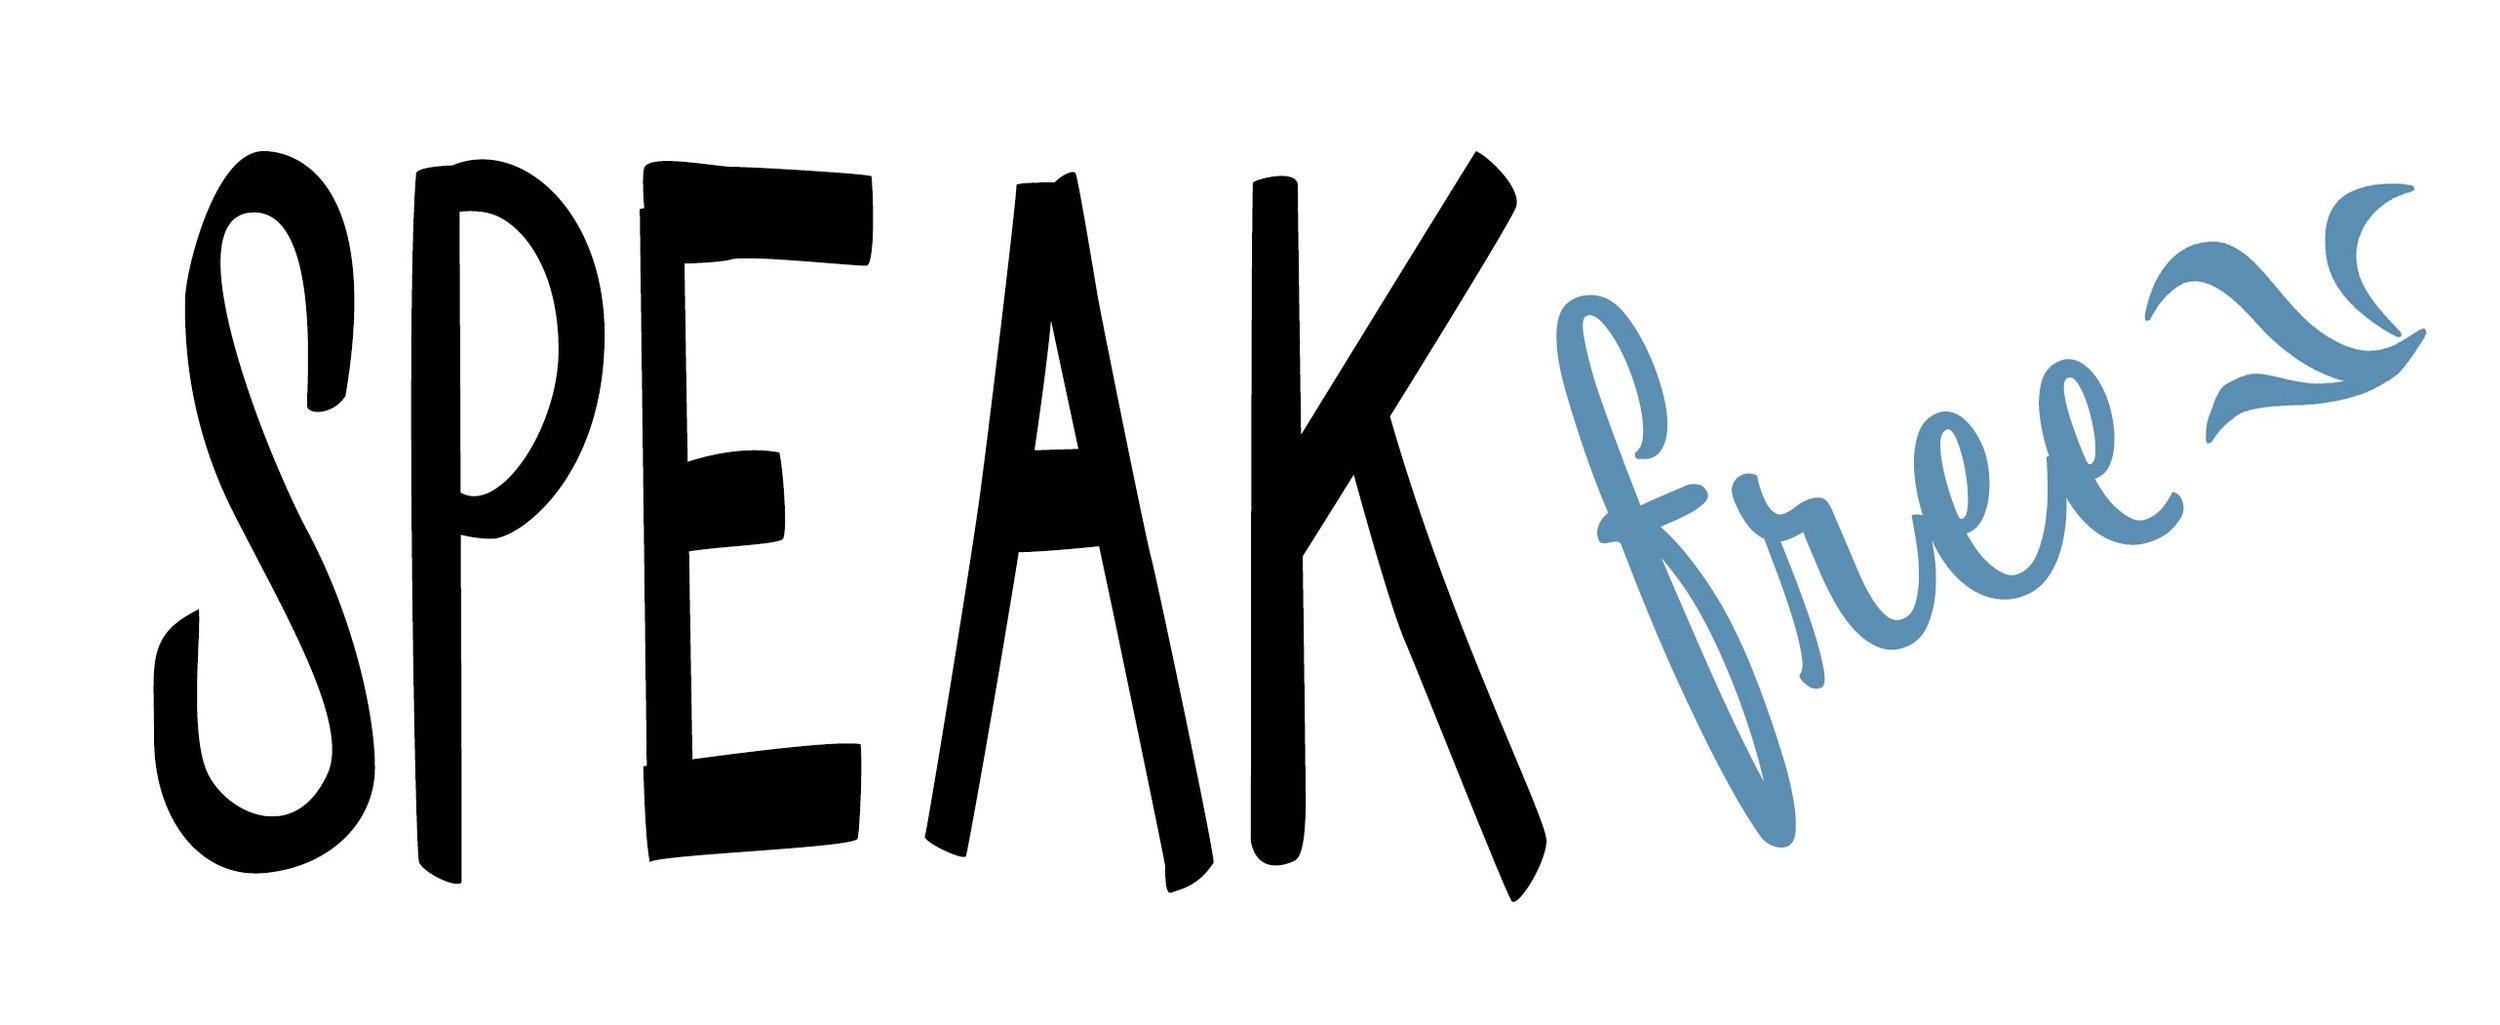 Speak Free.jpg